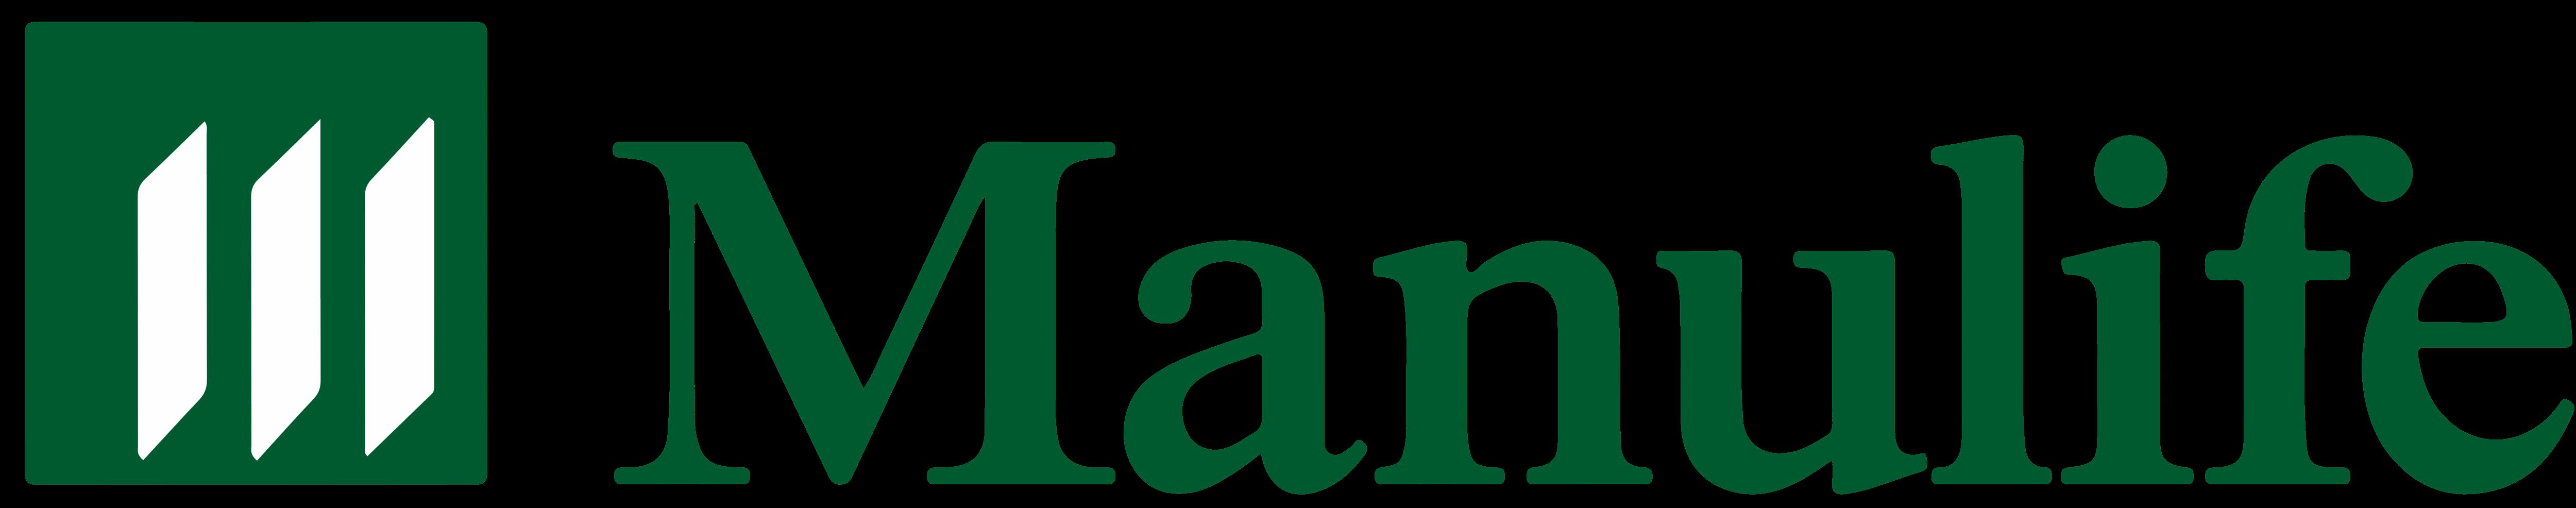 Manulife logo clipart png freeuse Manulife – Logos Download png freeuse